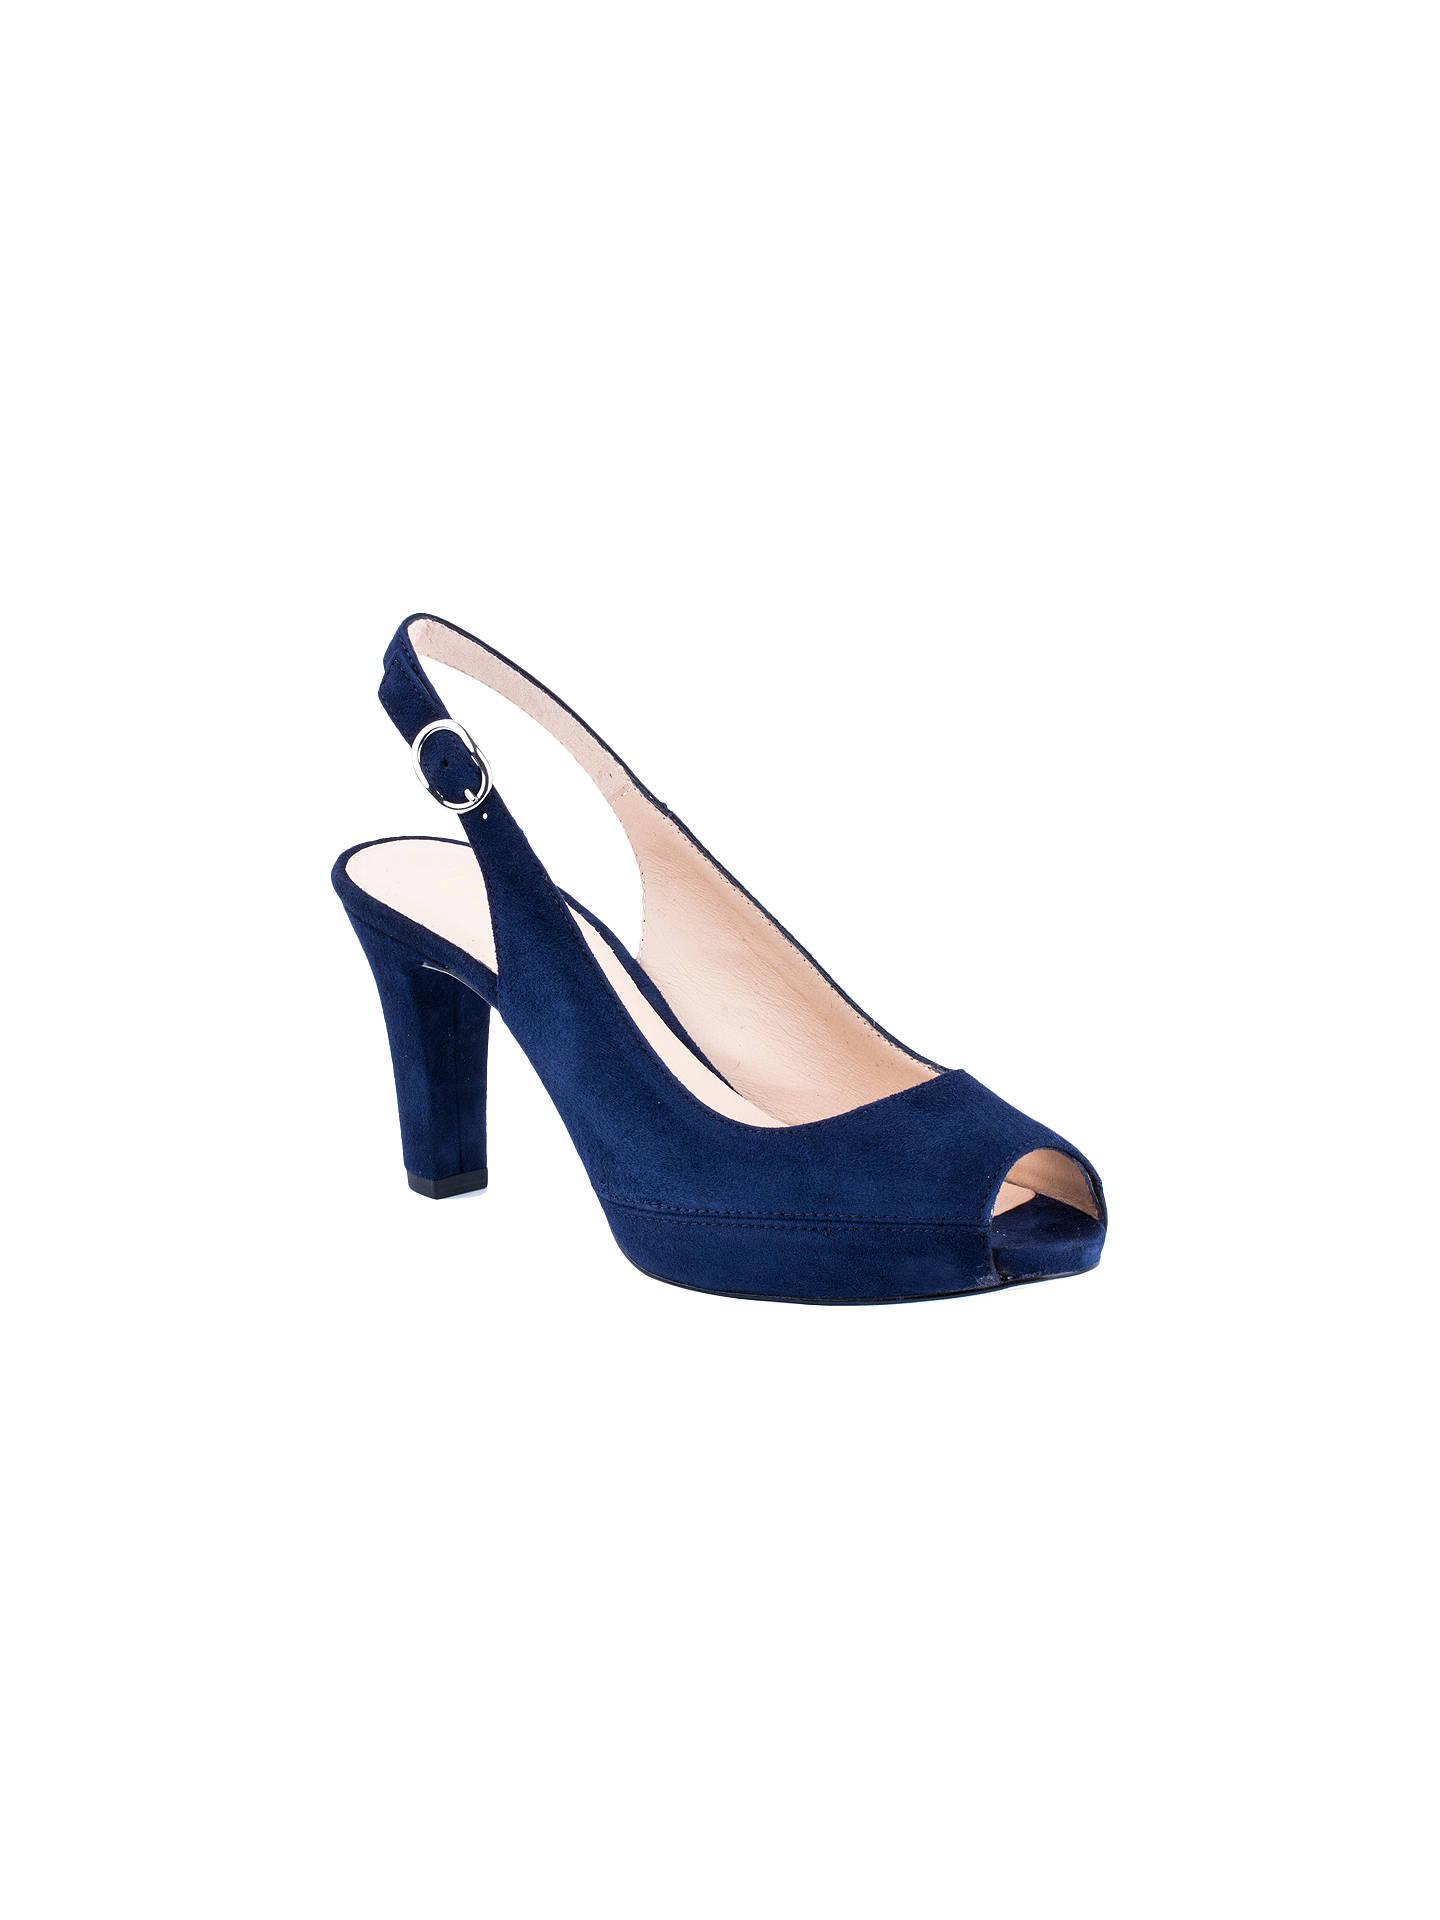 1af1f9a4c41c Unisa Nick Peep Toe Block Heeled Sandals at John Lewis   Partners